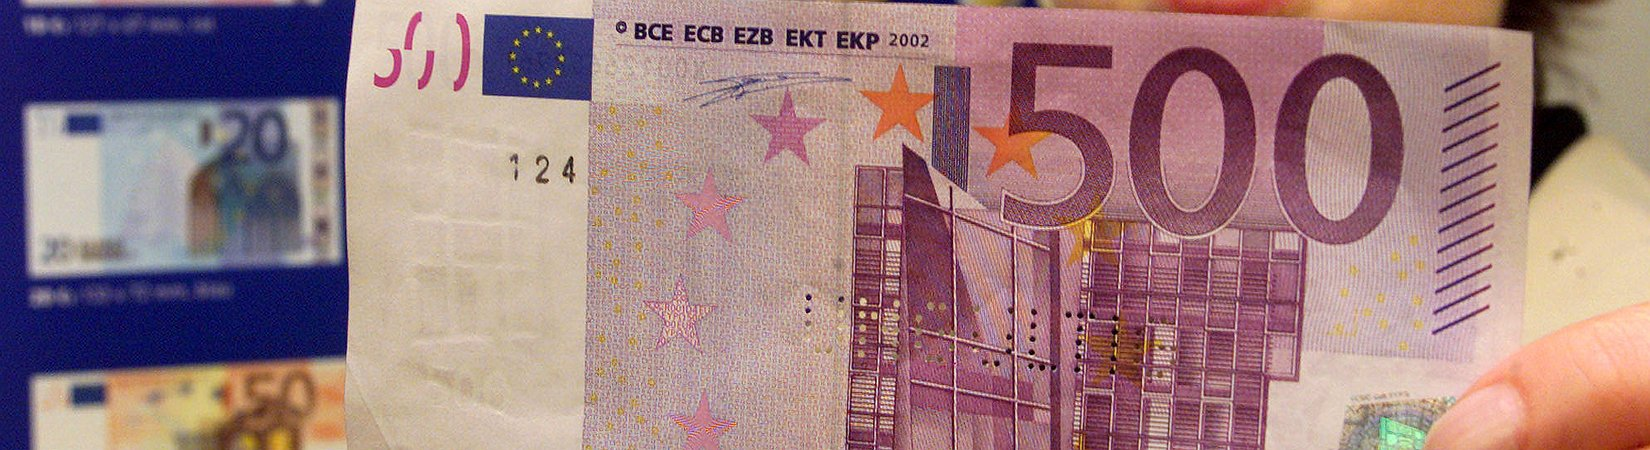 Почему у евро все впереди